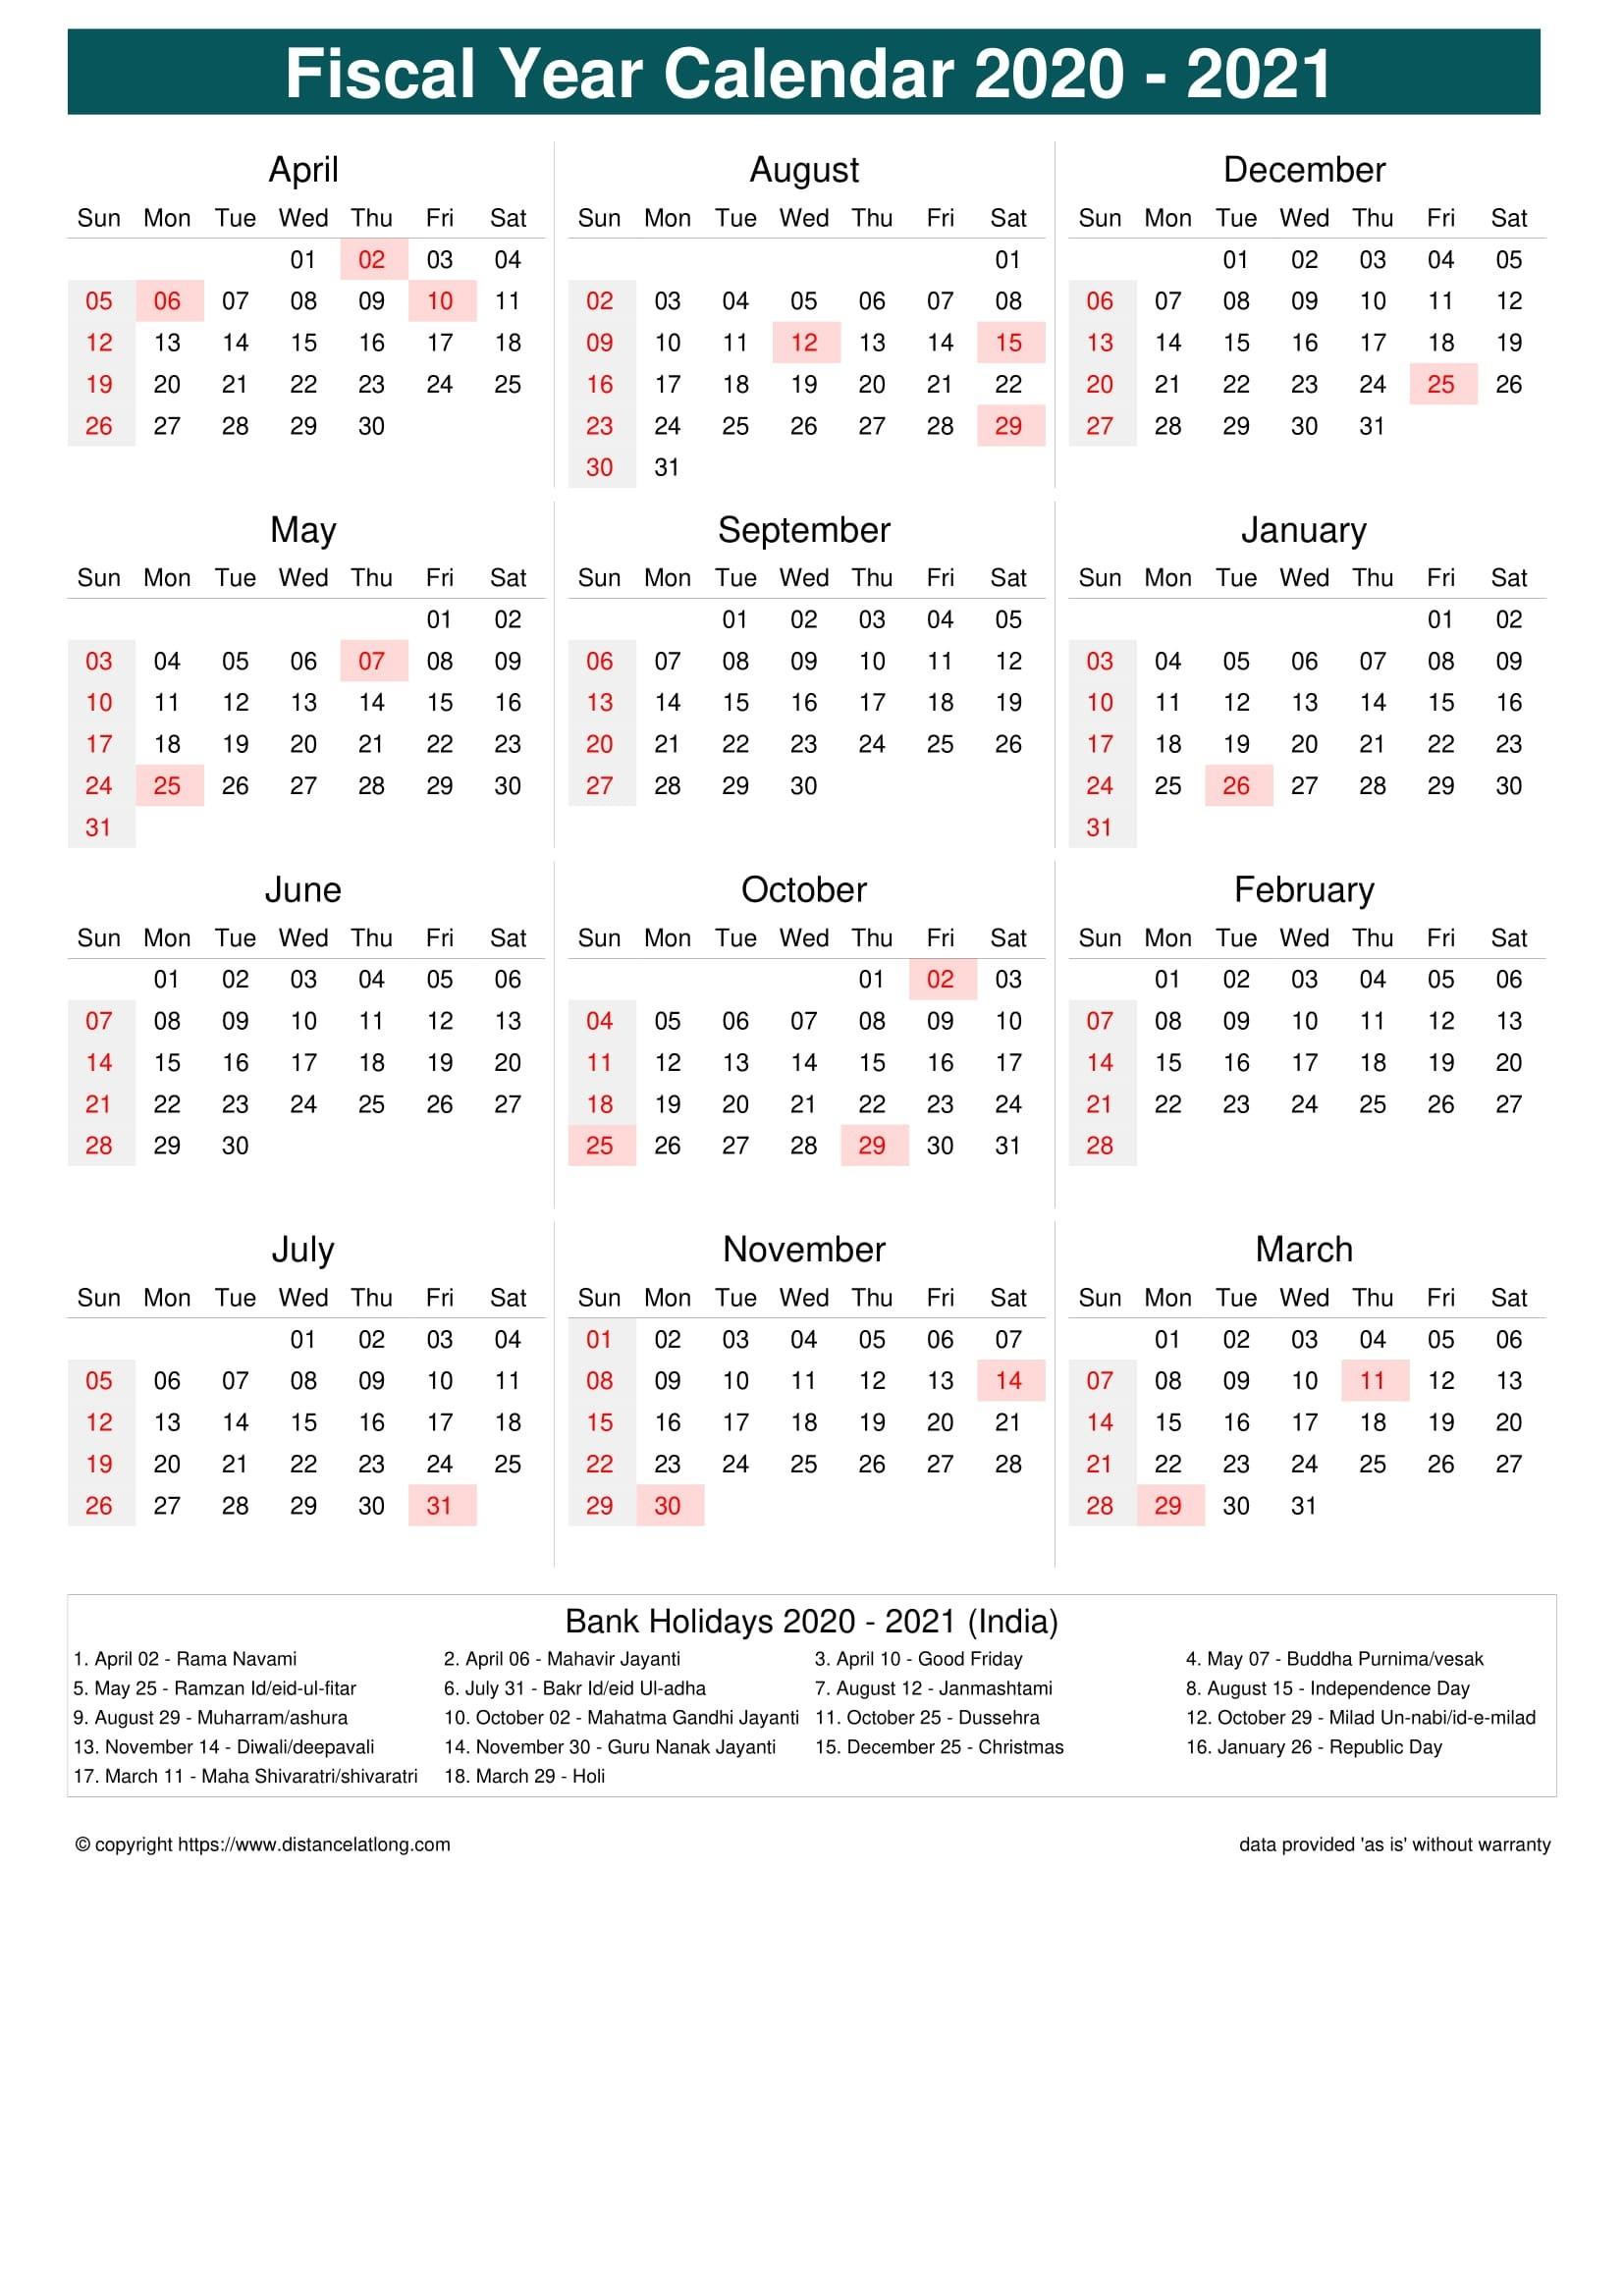 Fiscal Year 2020-2021 Calendar Templates, Free Printable  2021 Attendance Calendar Printable Pdf